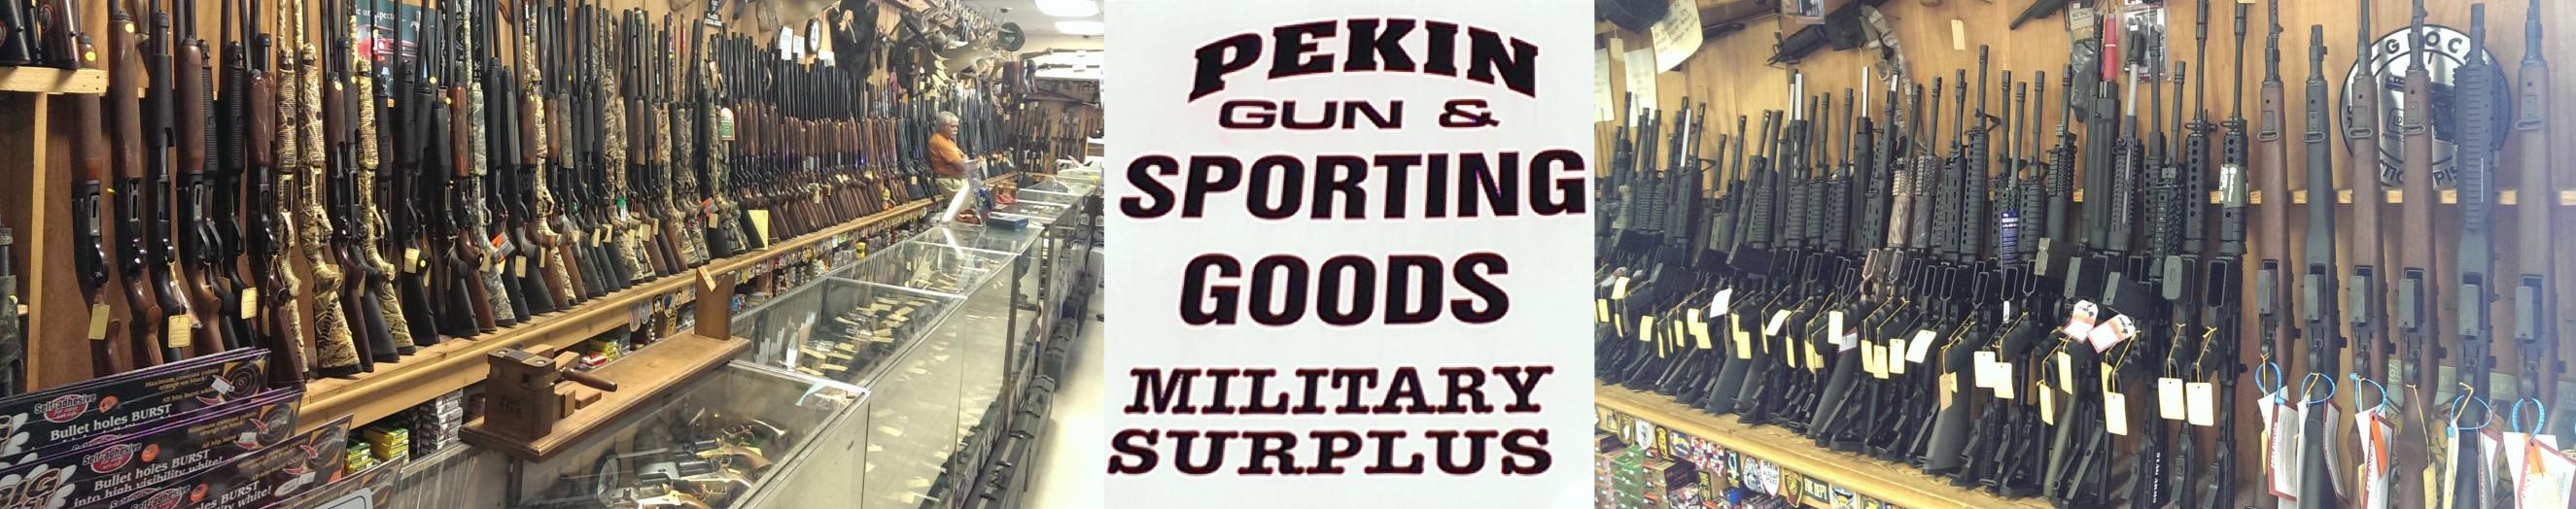 Pekin Gun and Sporting Goods